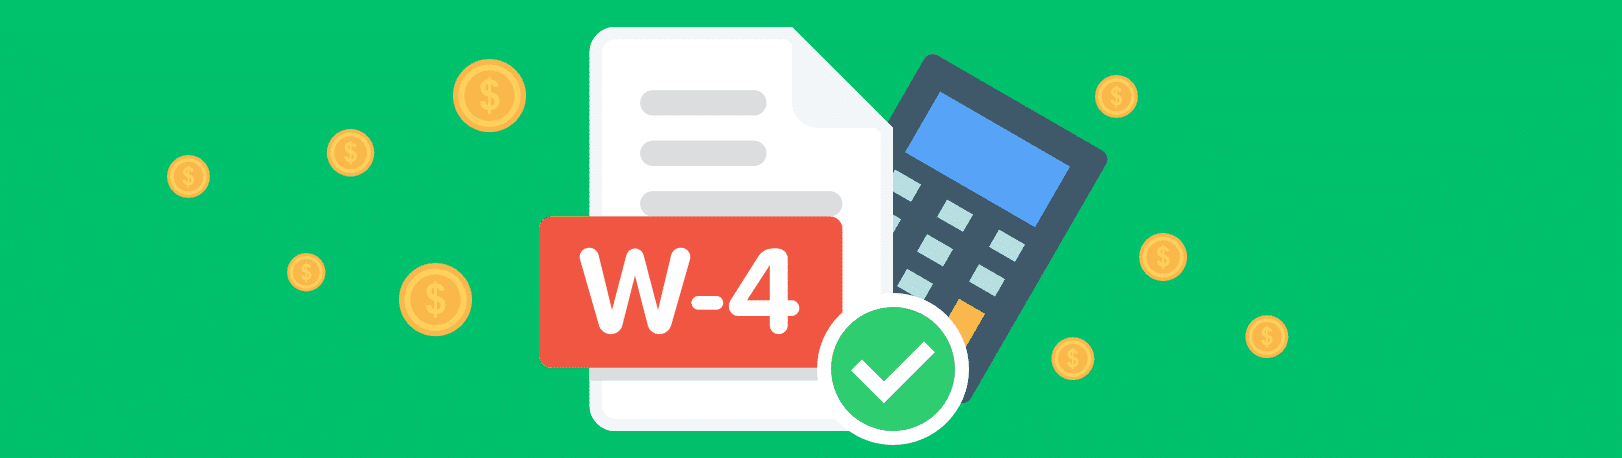 W-4 Calculator | GoCo io